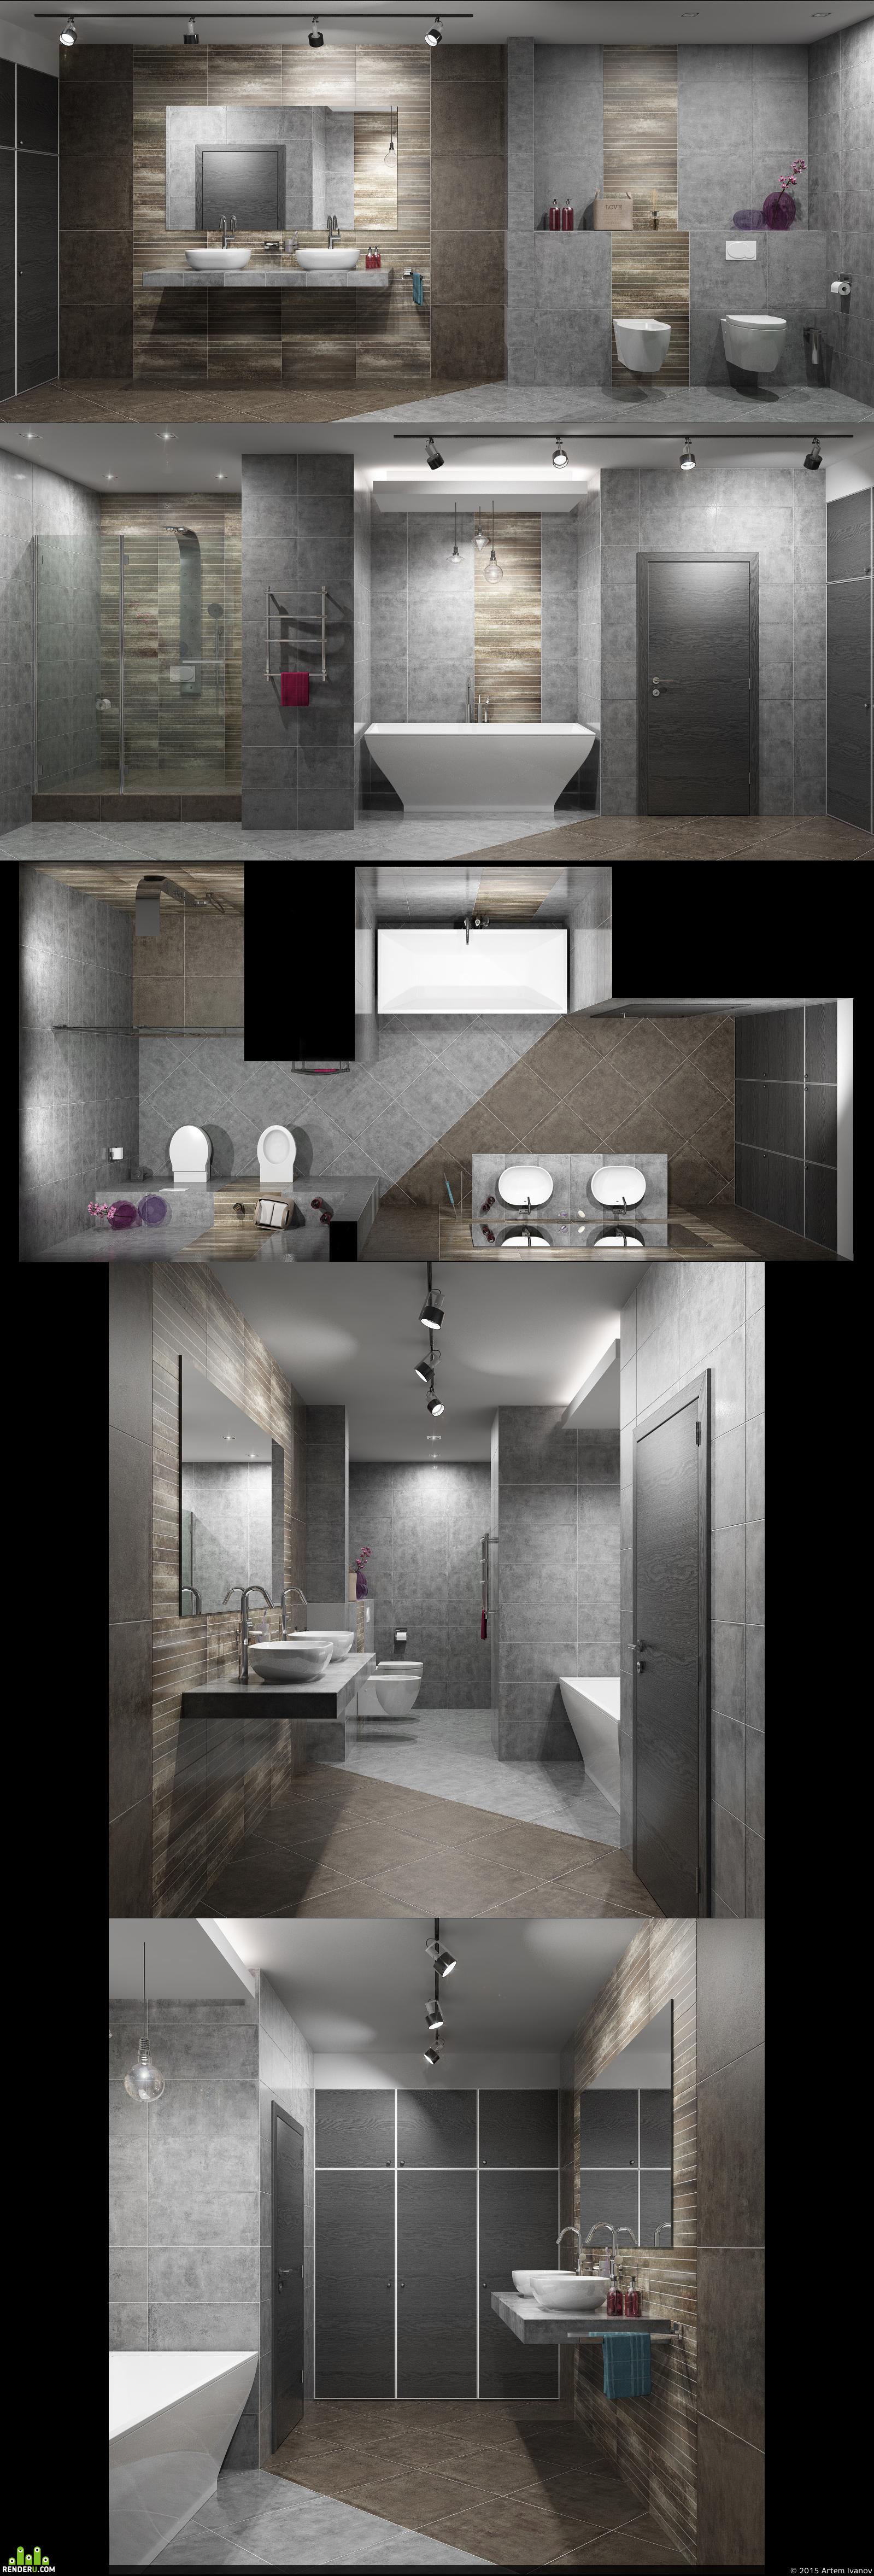 preview Дизайн интерьера ванной комнаты